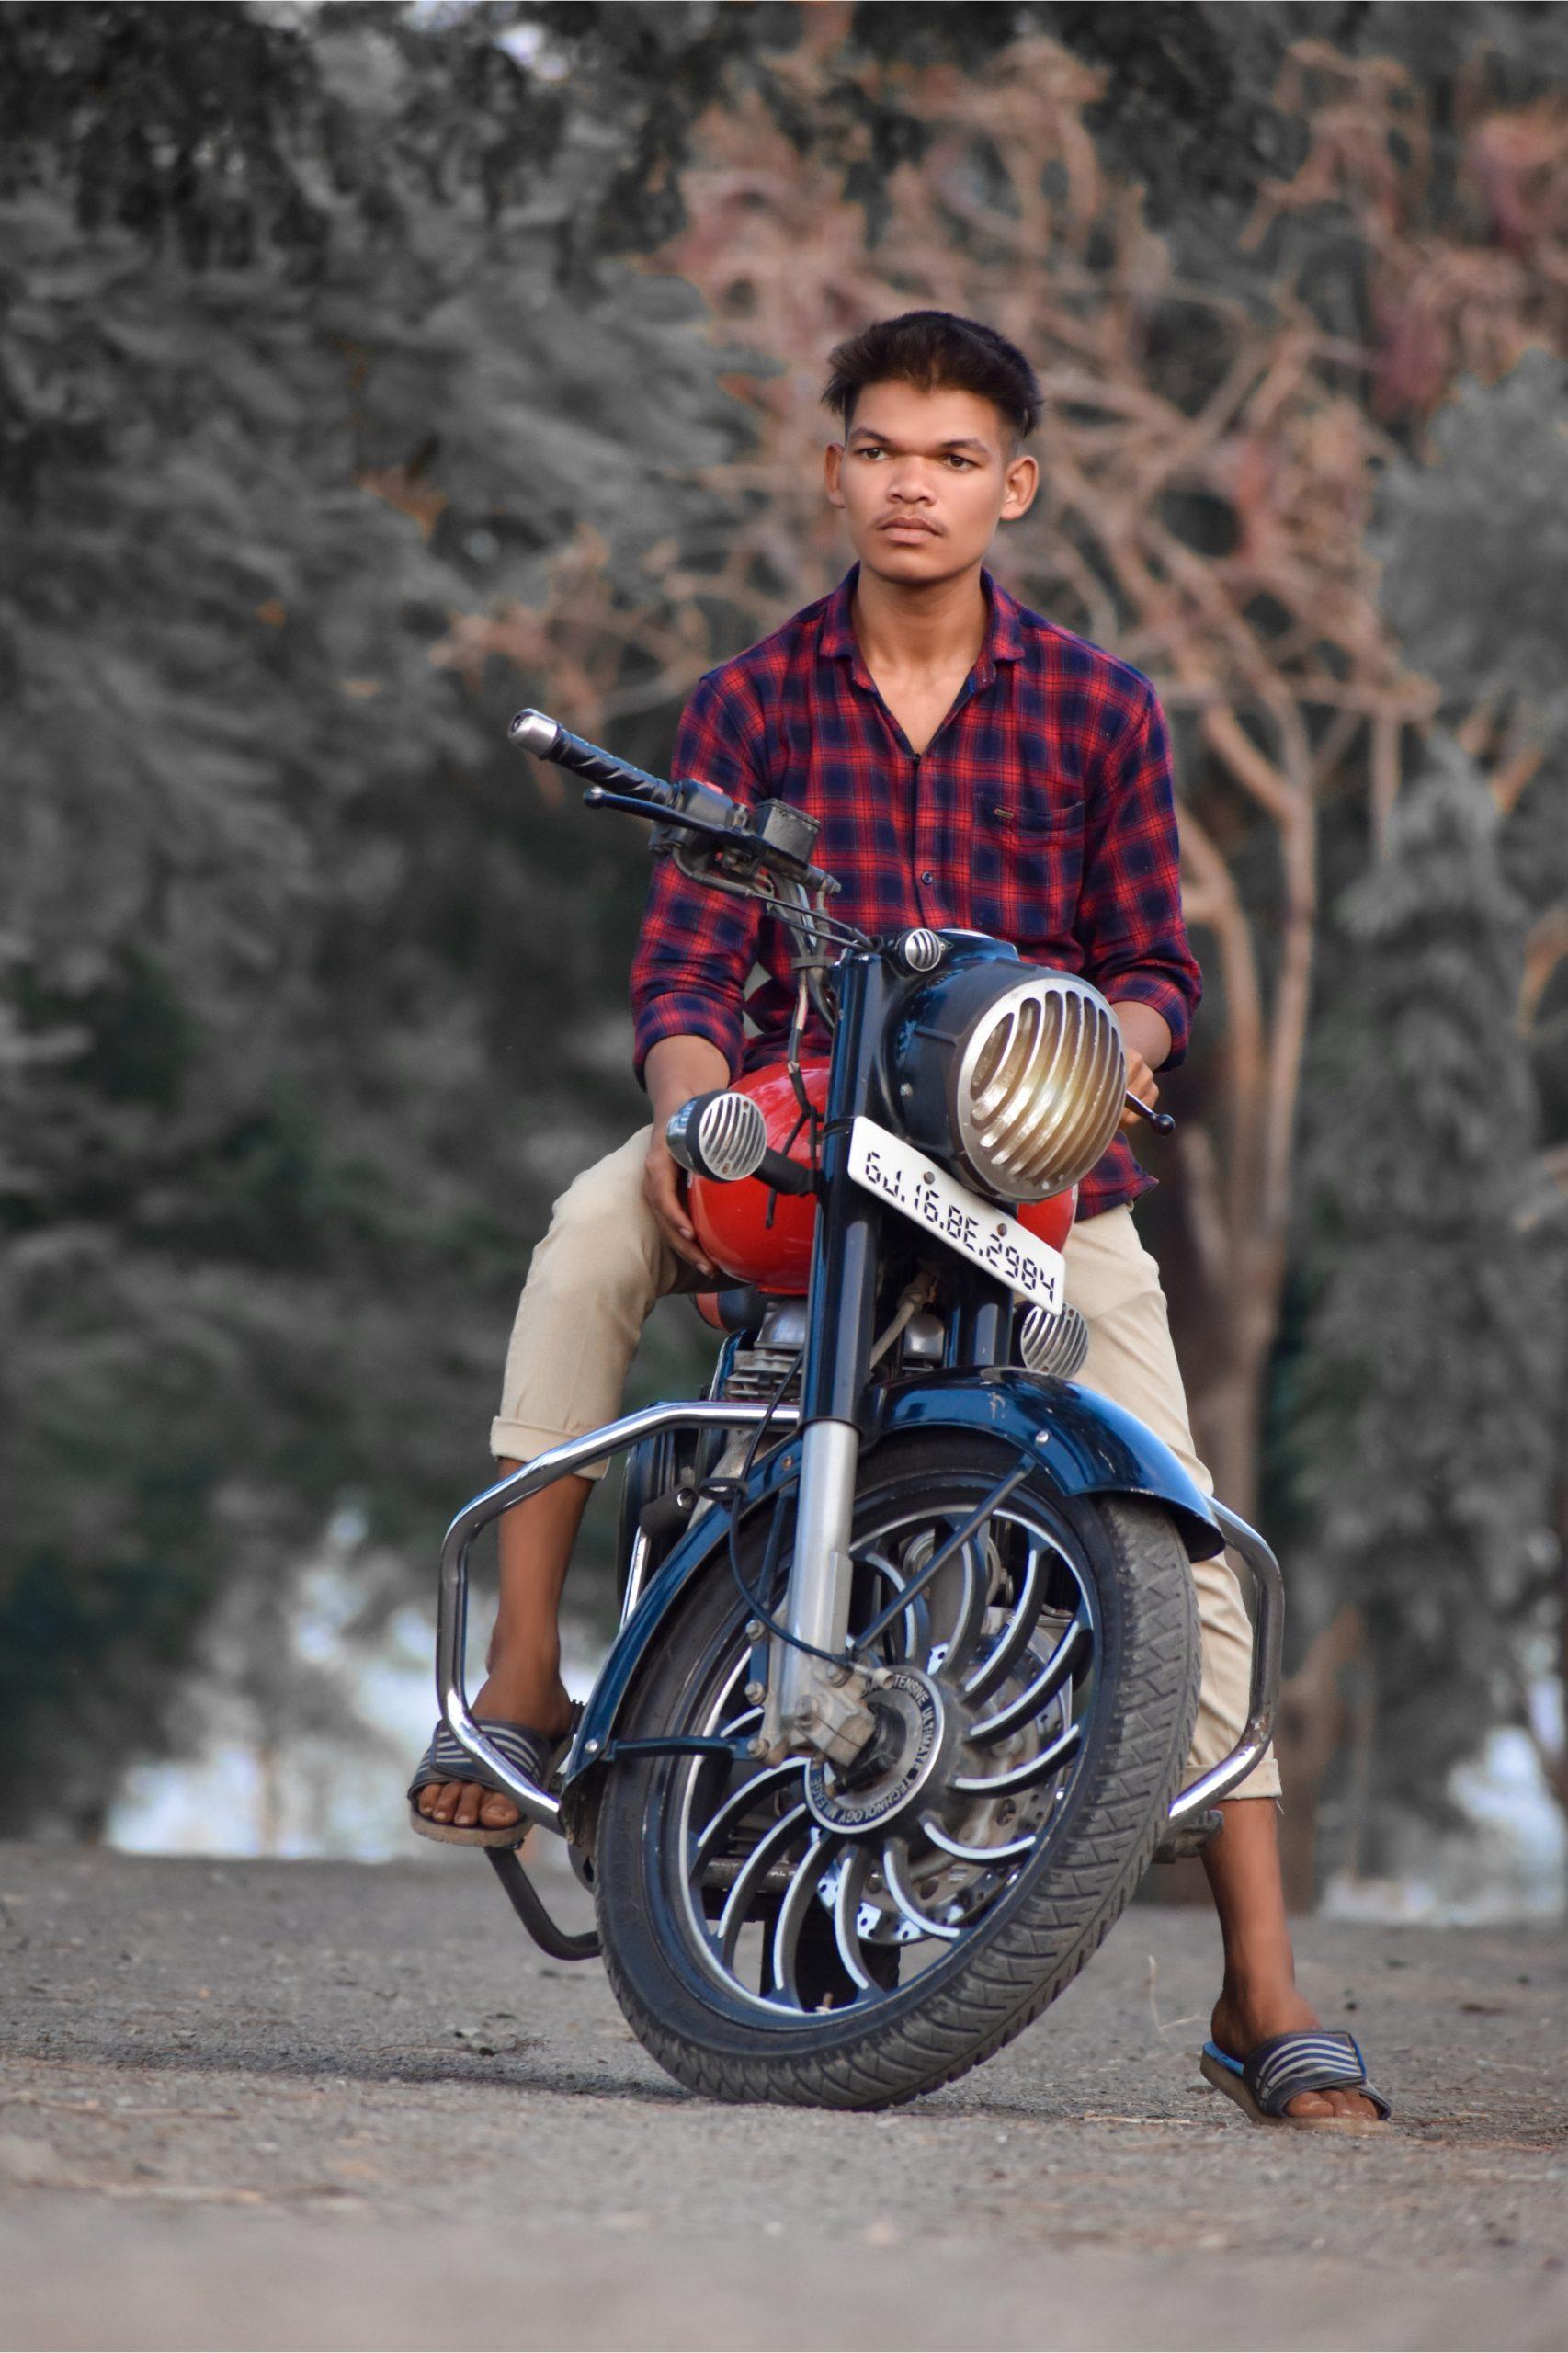 A boy on a bike